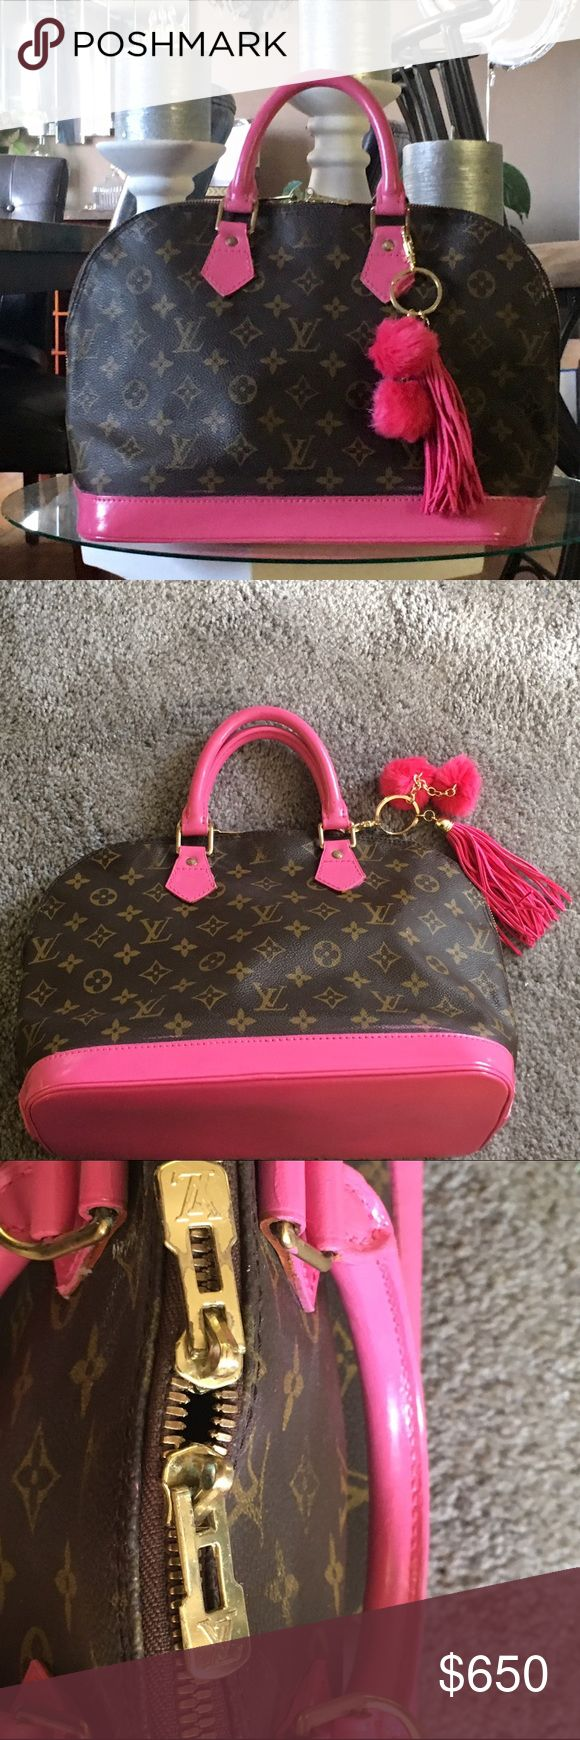 "Authentic Louis Vuitton Alma handbag Authentic Louis Vuitton Alma handbag. Unique pink leather handles and bottom. ✳️looks like new! Model / Brand ModelMonogram BrandLouis Vuitton General Model NumberM51130 NameAlma Country of OriginFrance.                  TypeHandbag GenderWomen Material Monogram ColorMonogram ClosureZipper Inner PocketOpen x 1 Phone holder x 1 Weight23.28oz. 9.25"" L 12.6 W Serial NumberVI1926. 😊key chain included Louis Vuitton Bags"